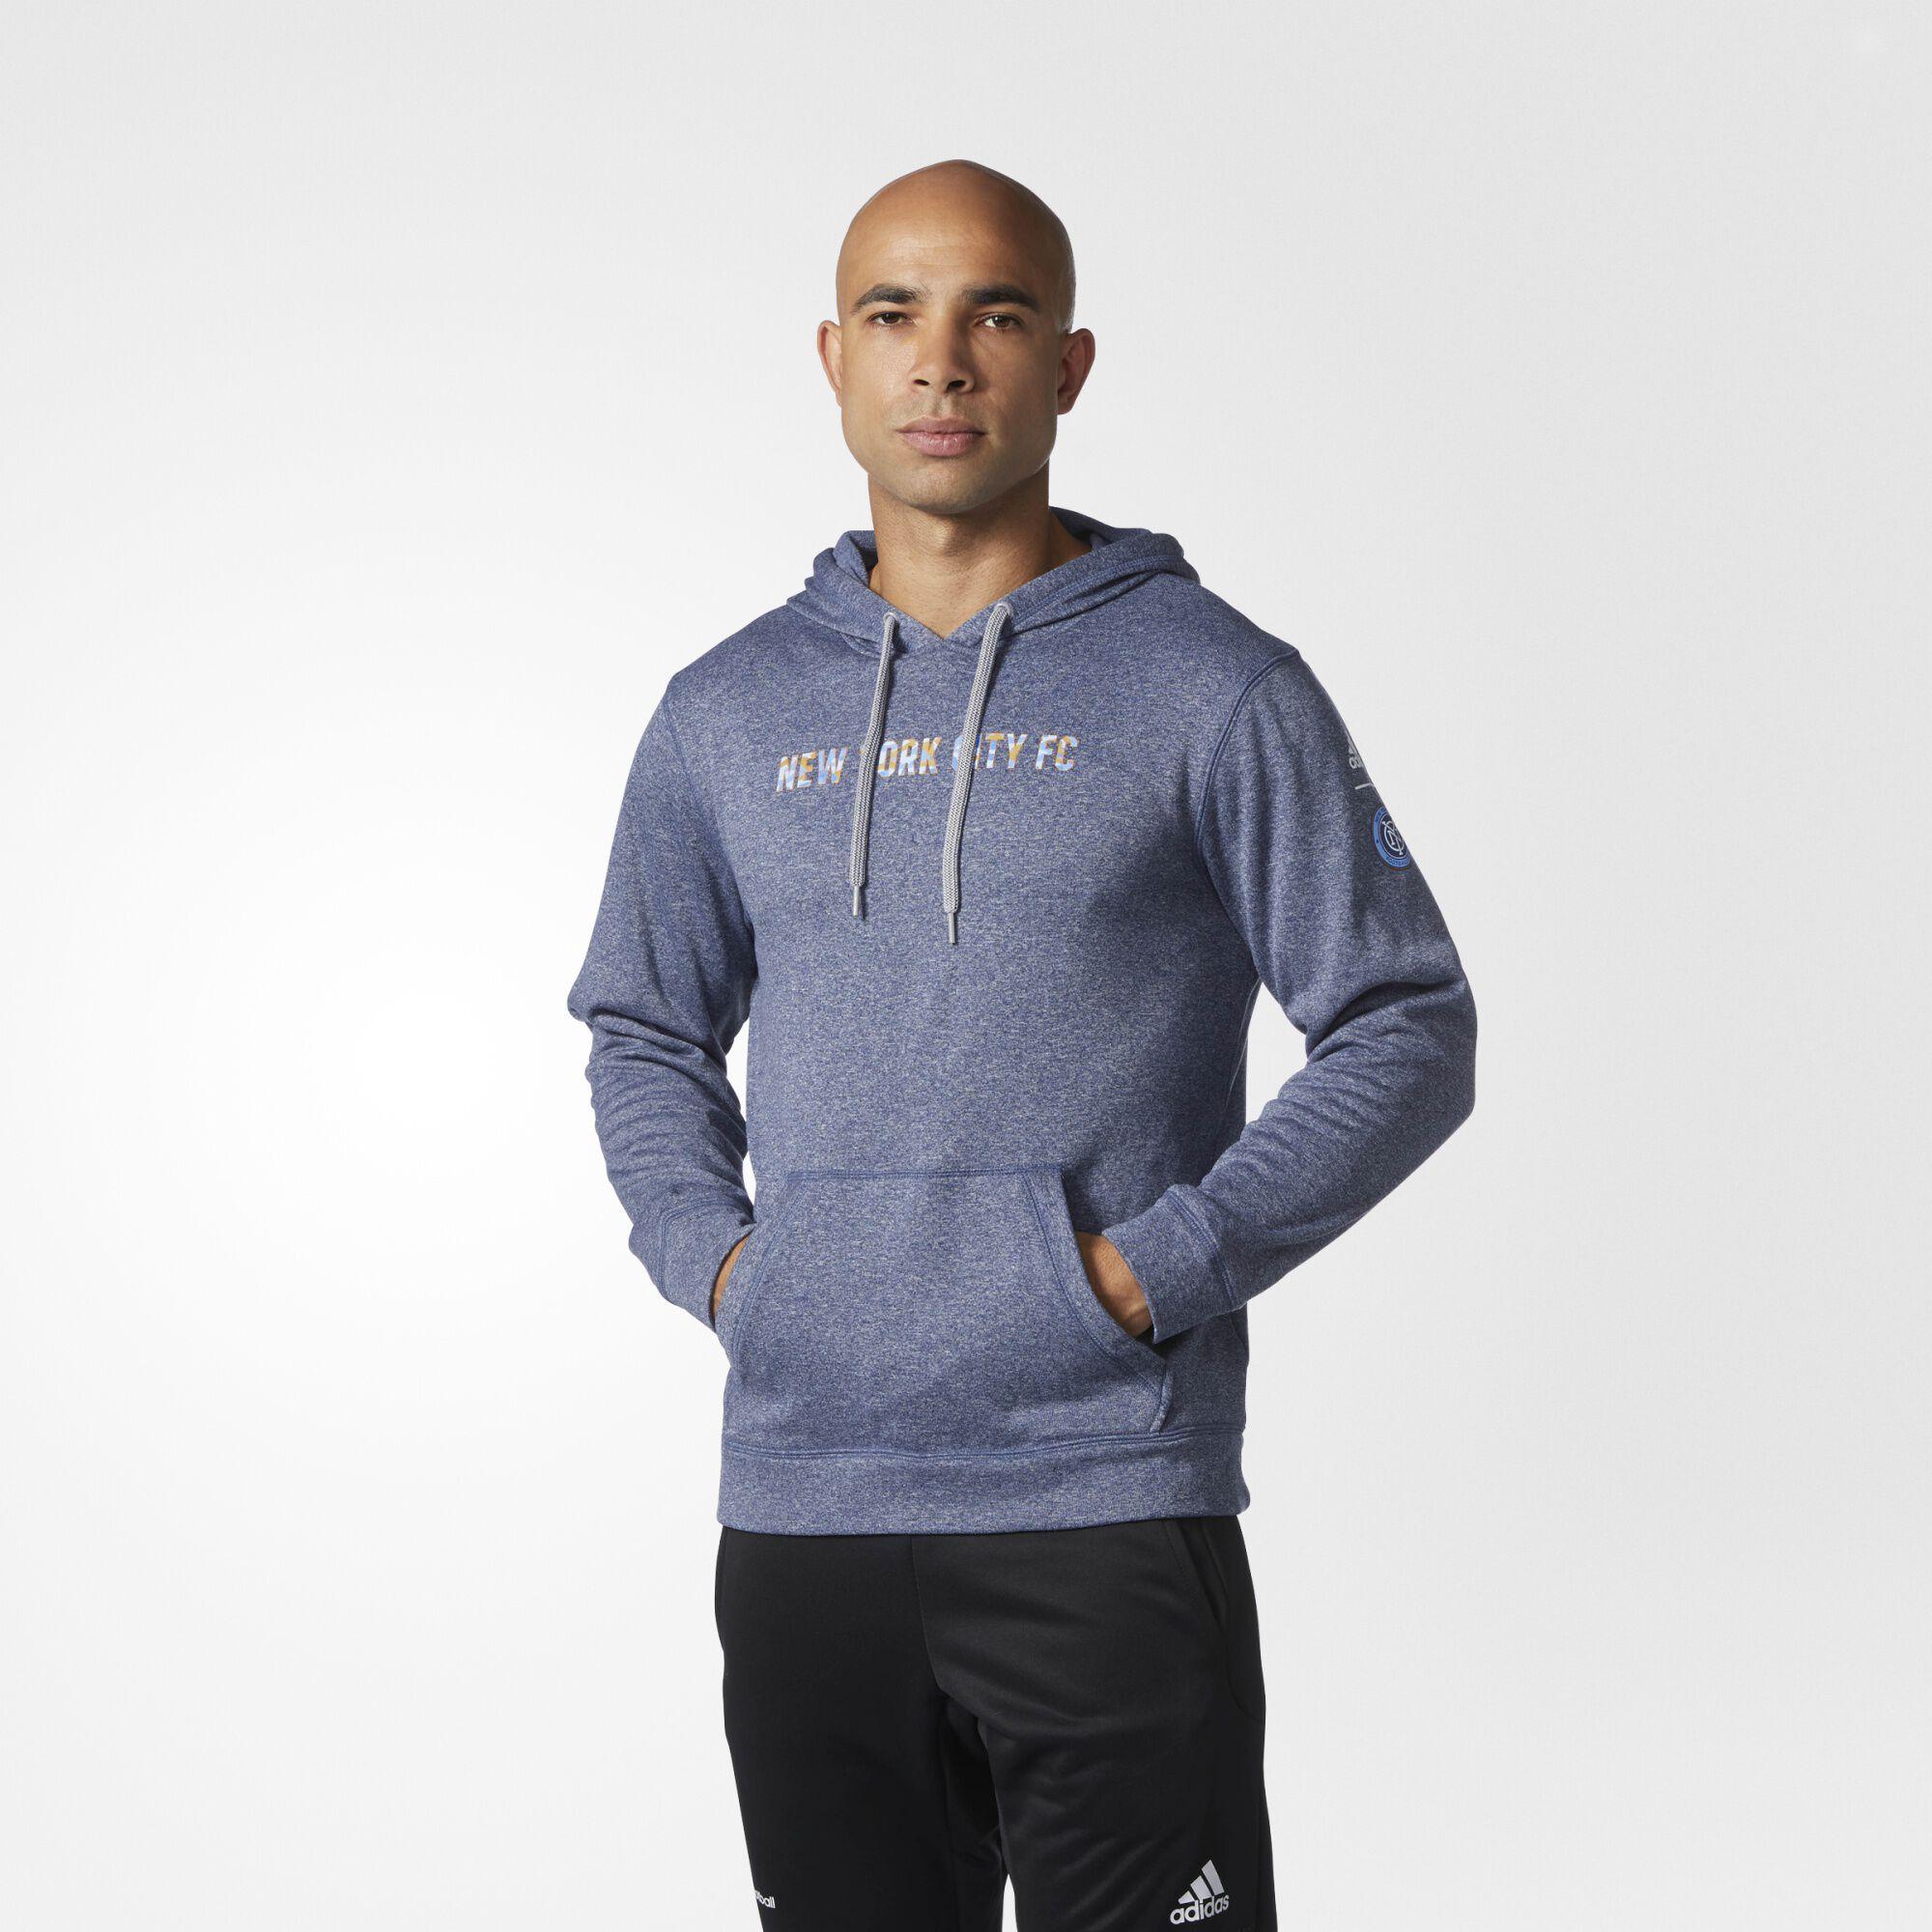 8d8c5b5474b0 navy blue adidas hoodie on sale   OFF76% Discounted